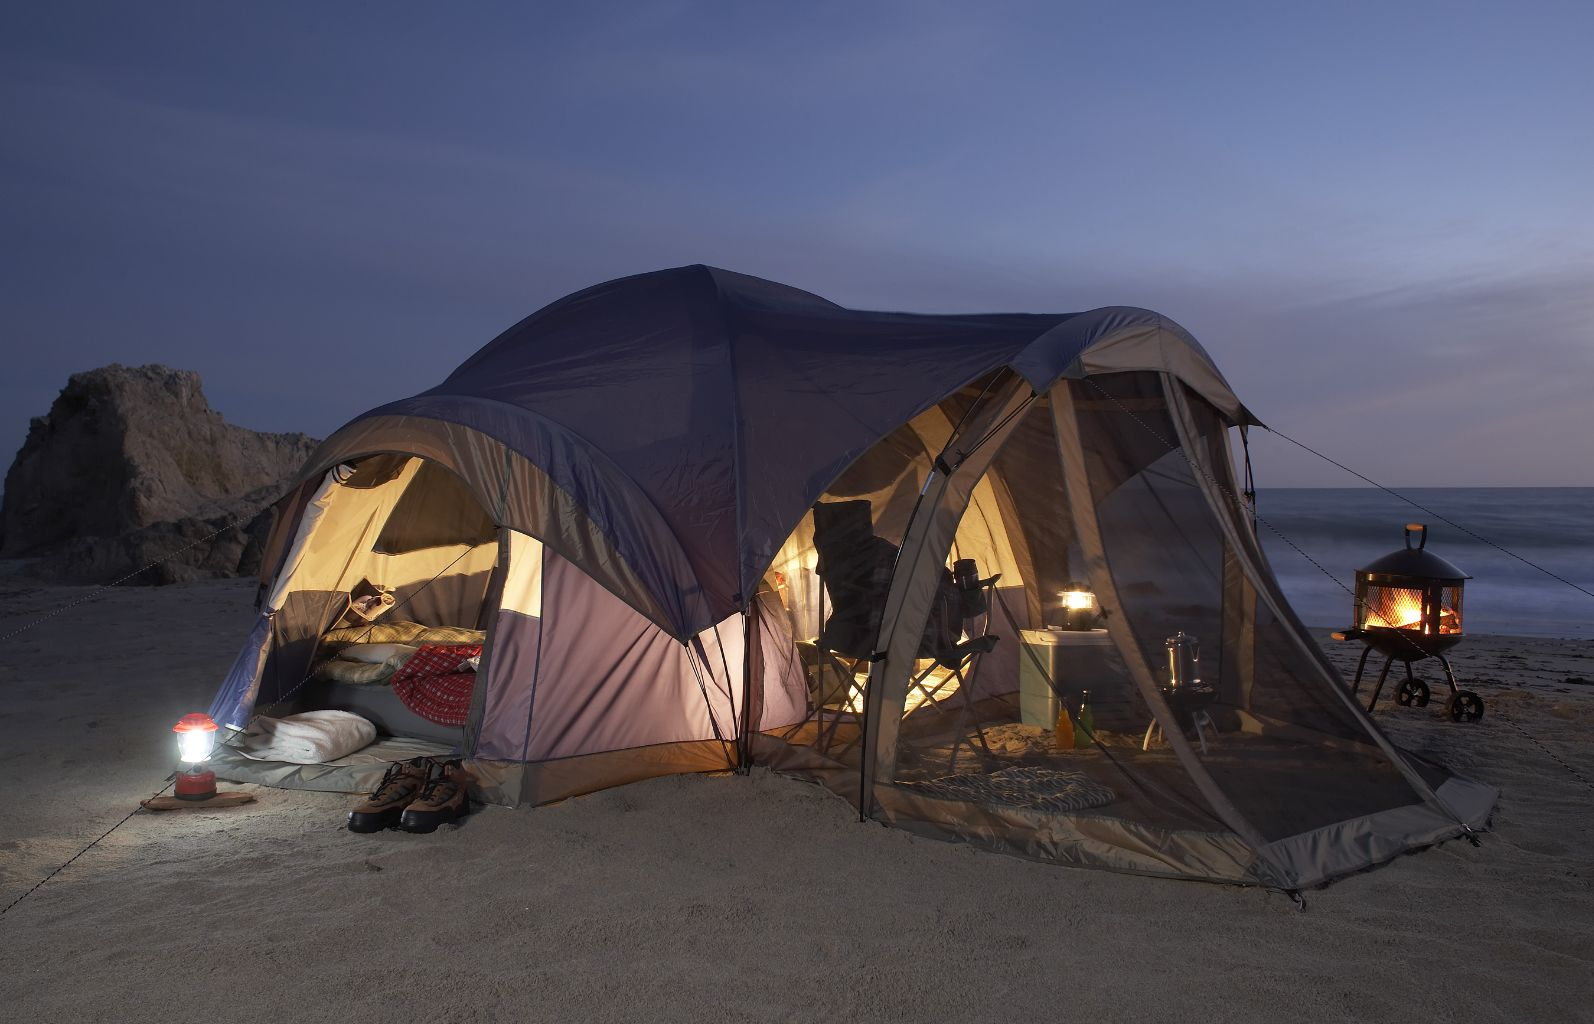 About Hana Camp Gear